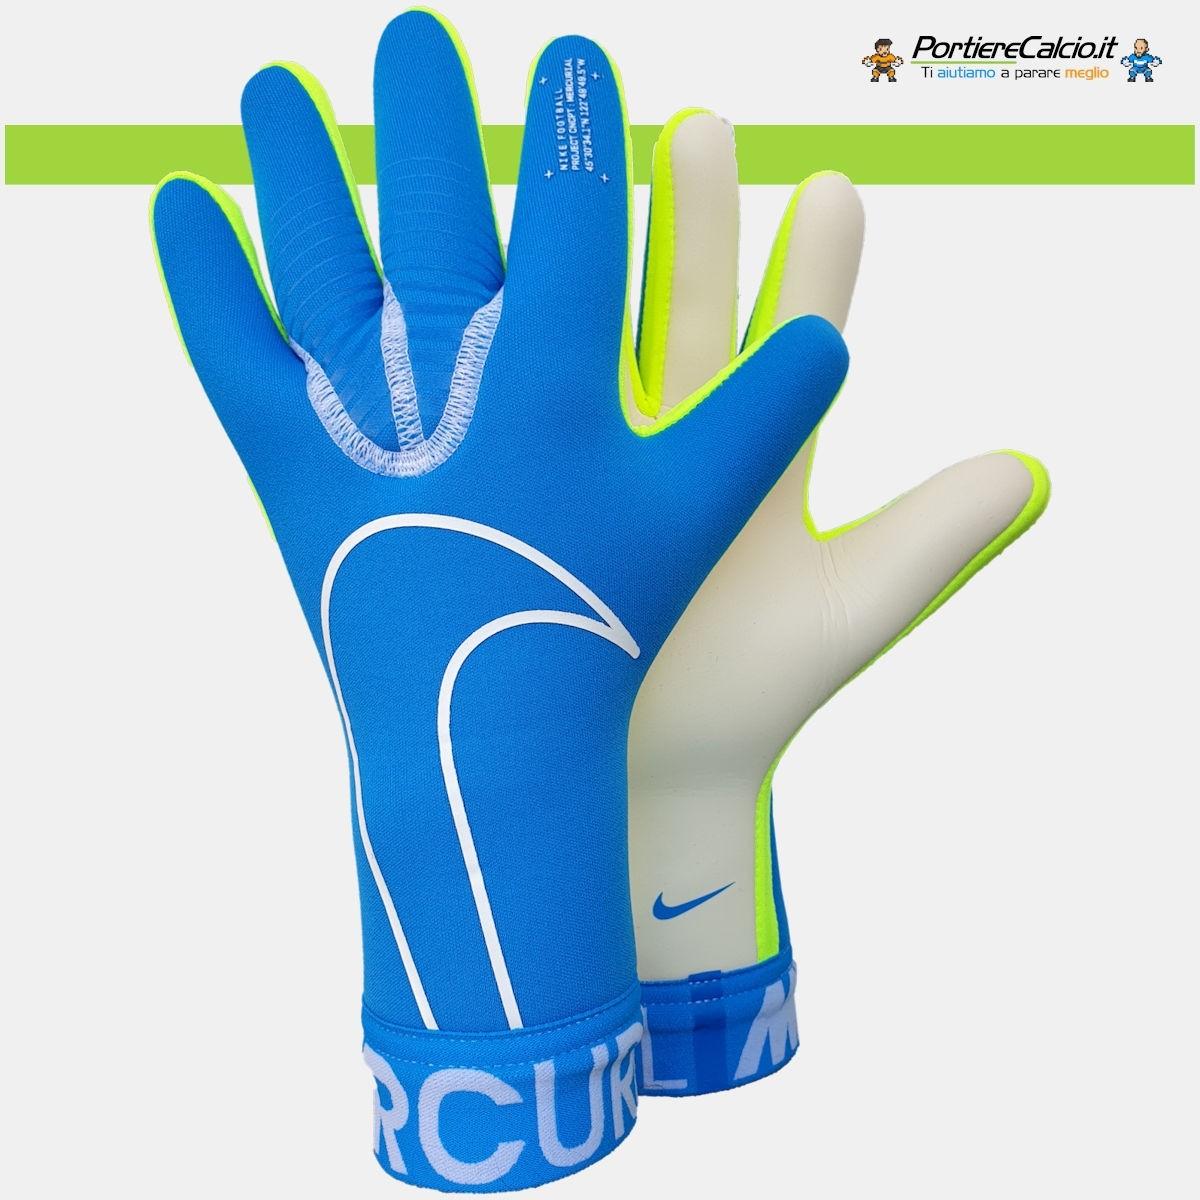 new product 239aa 42e6f Mercurial Touch Victory azzurri